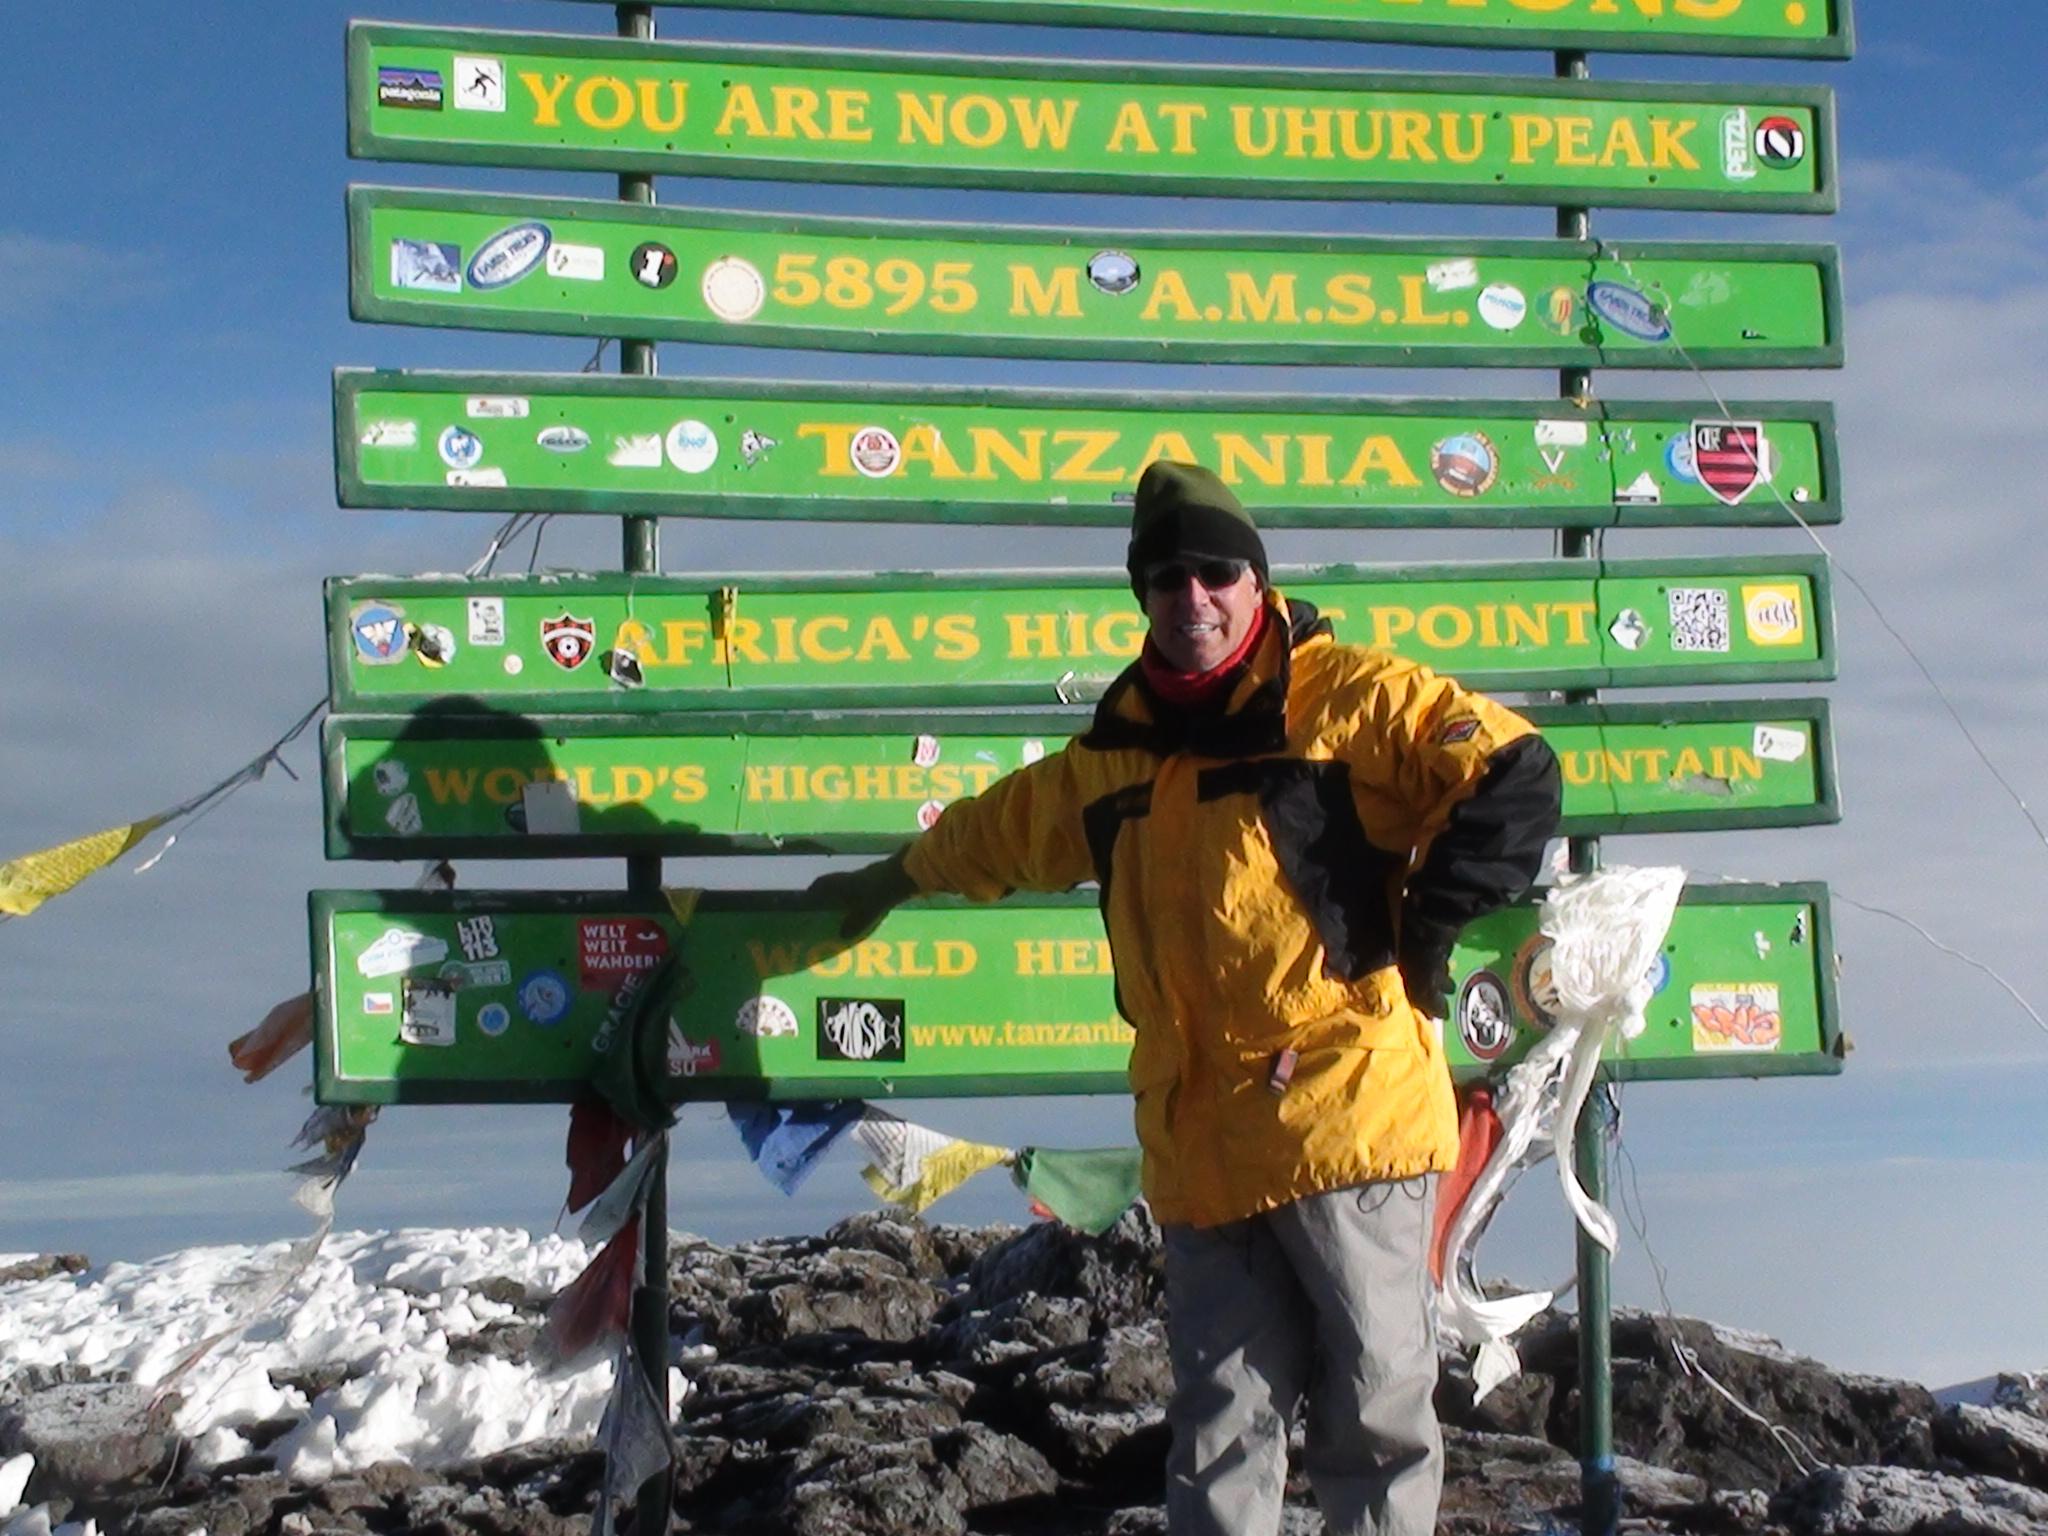 Macon Dunnagan on the Summit of Kilimanjaro